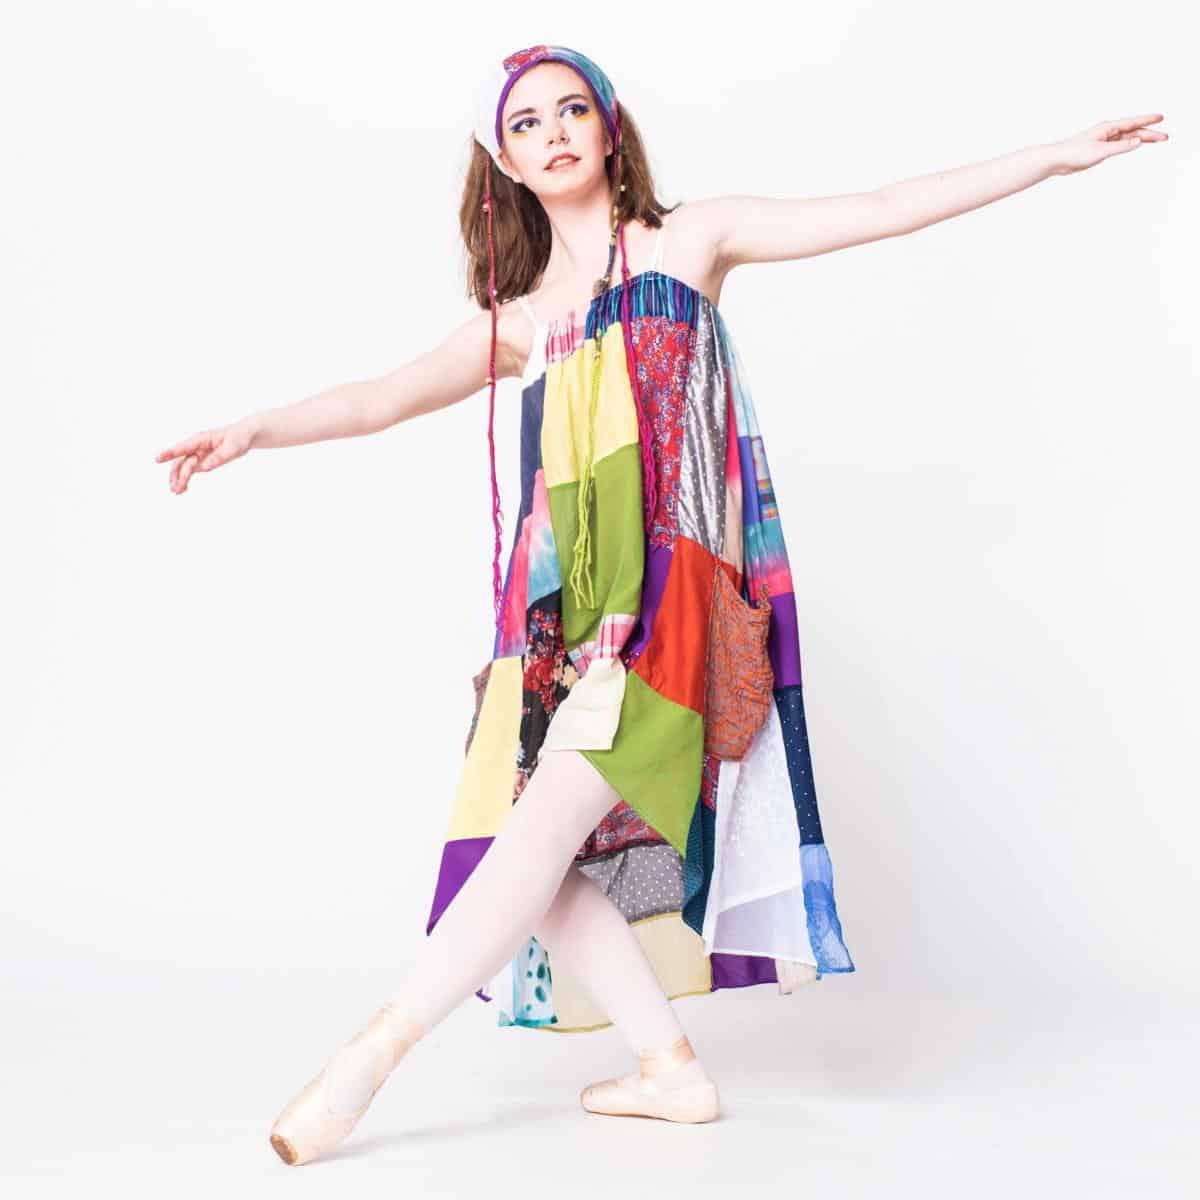 style hannover alextravagant tanzakademie hannover - Alexandra Weber - Bühnenoutfits mit Klasse